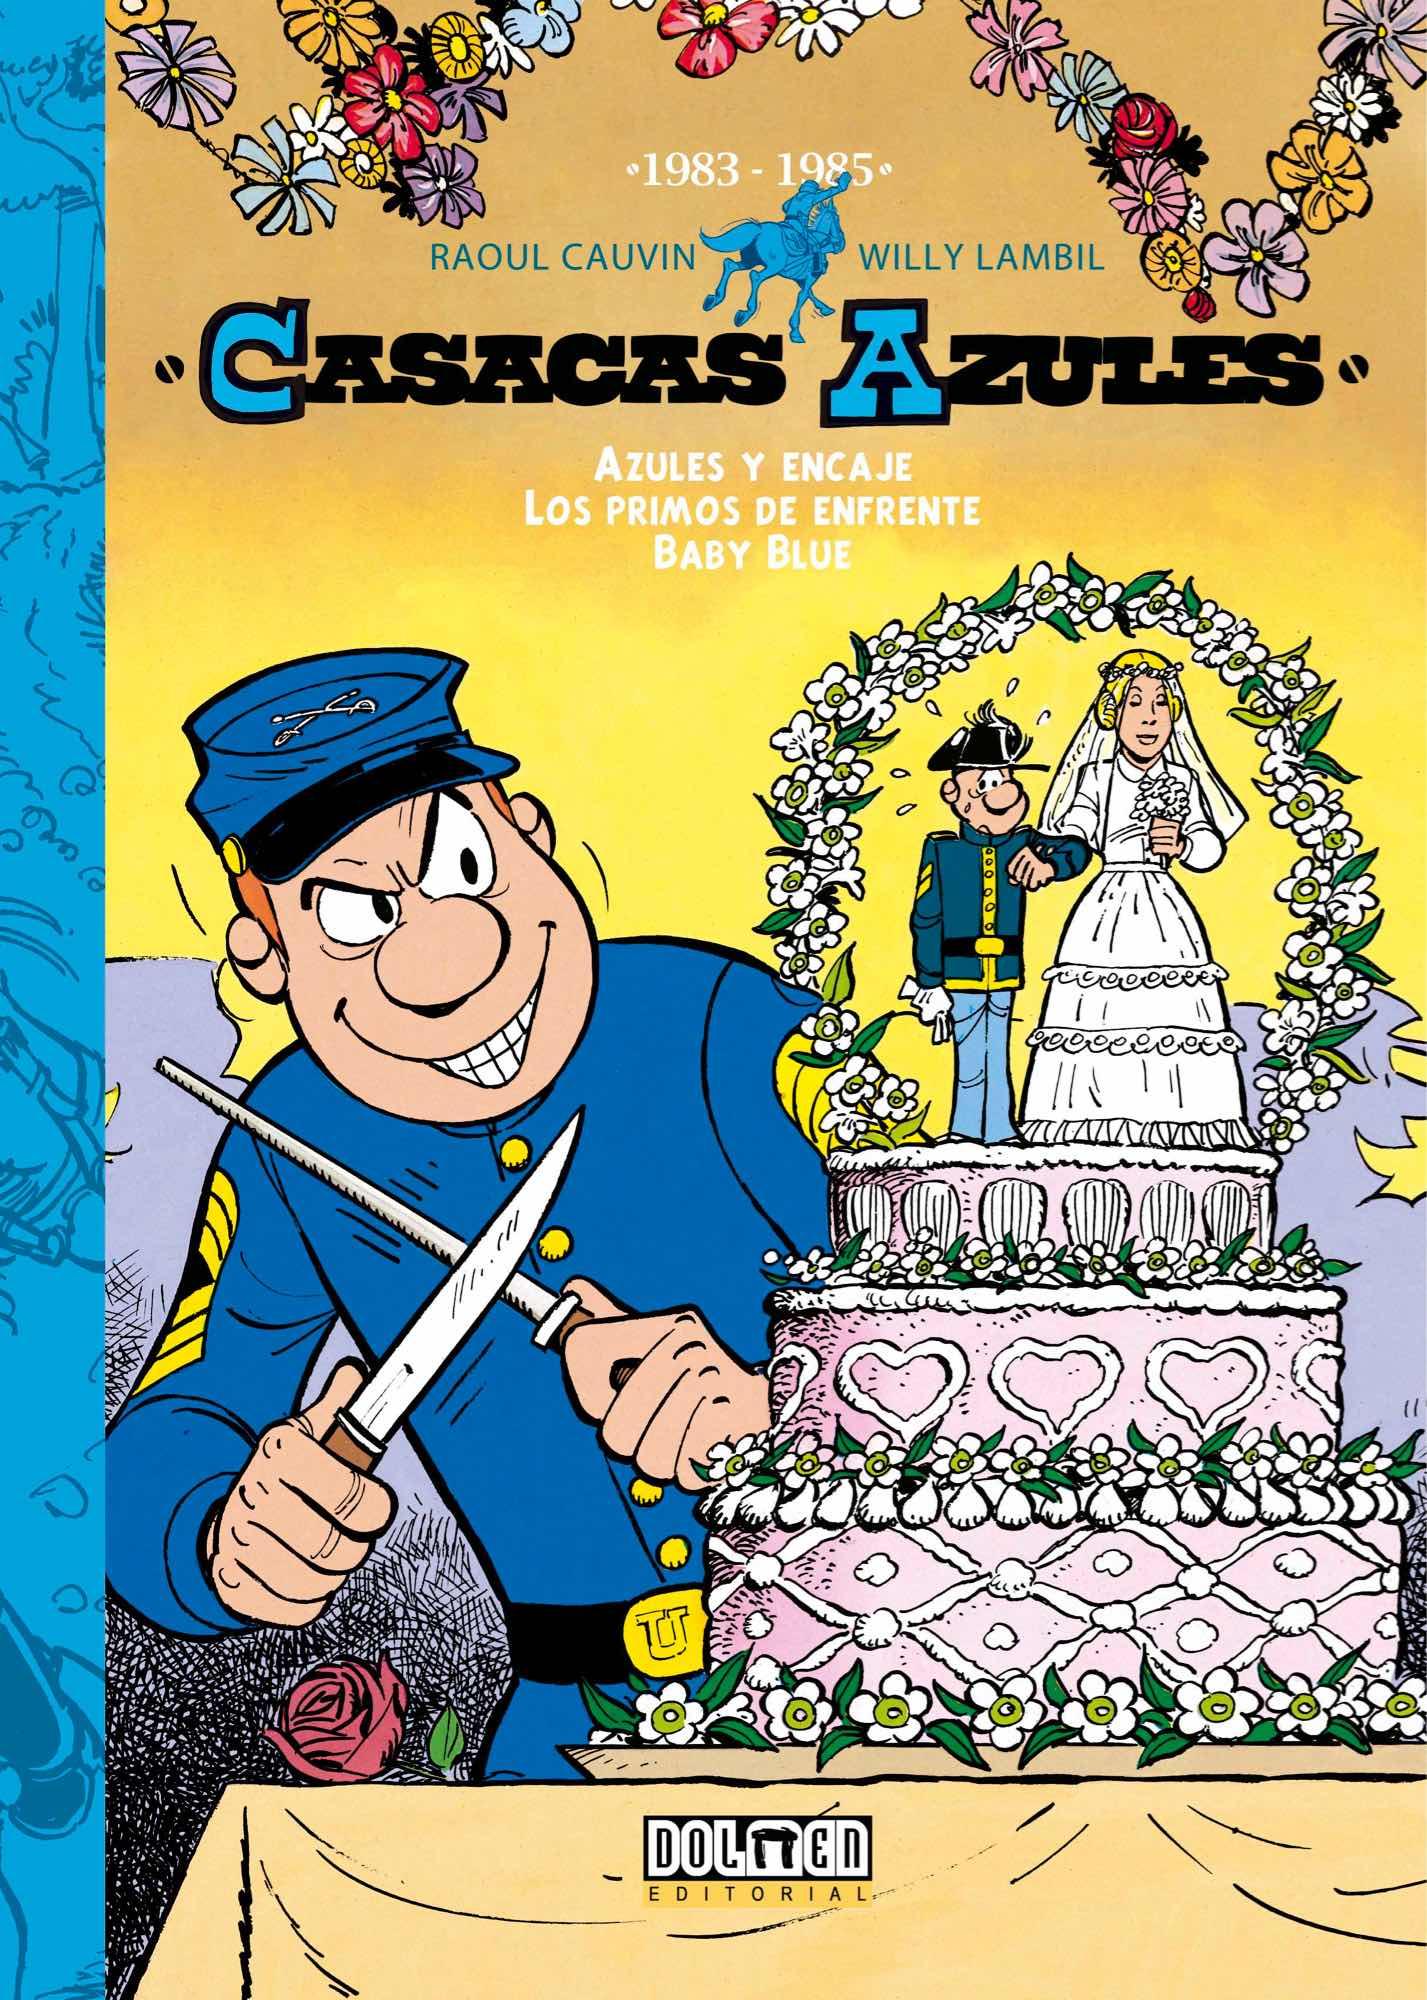 CASACAS AZULES 1983-1985